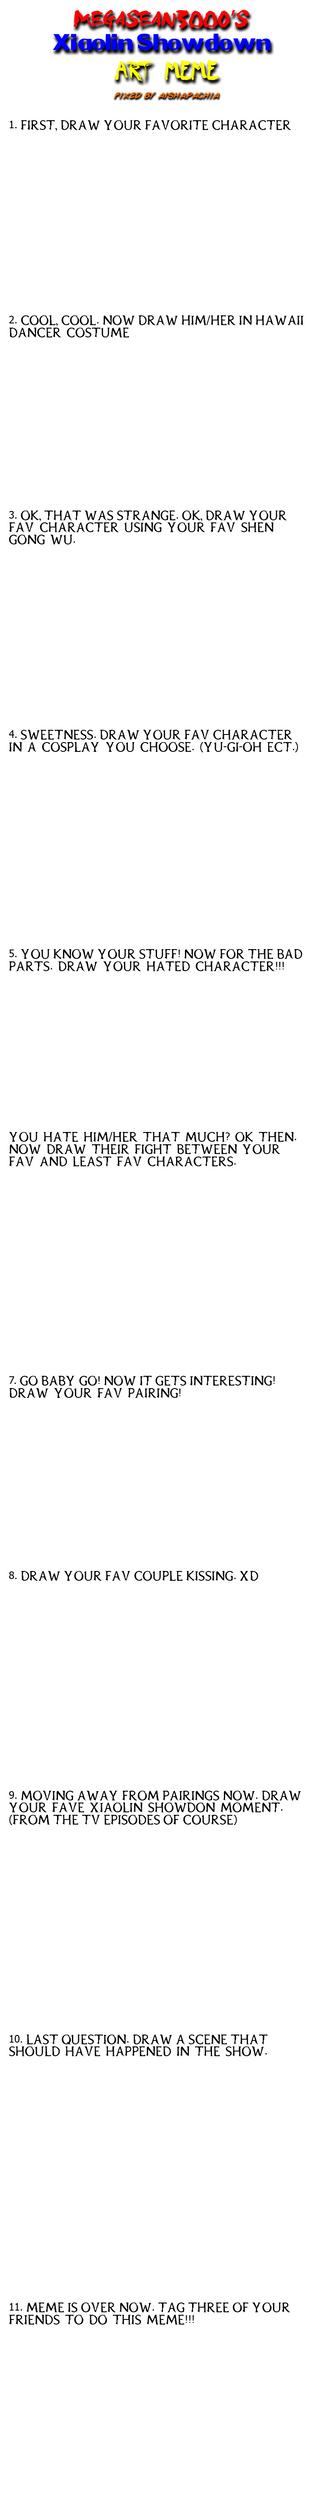 Xiaolin Showdown Art Meme by megasean3000